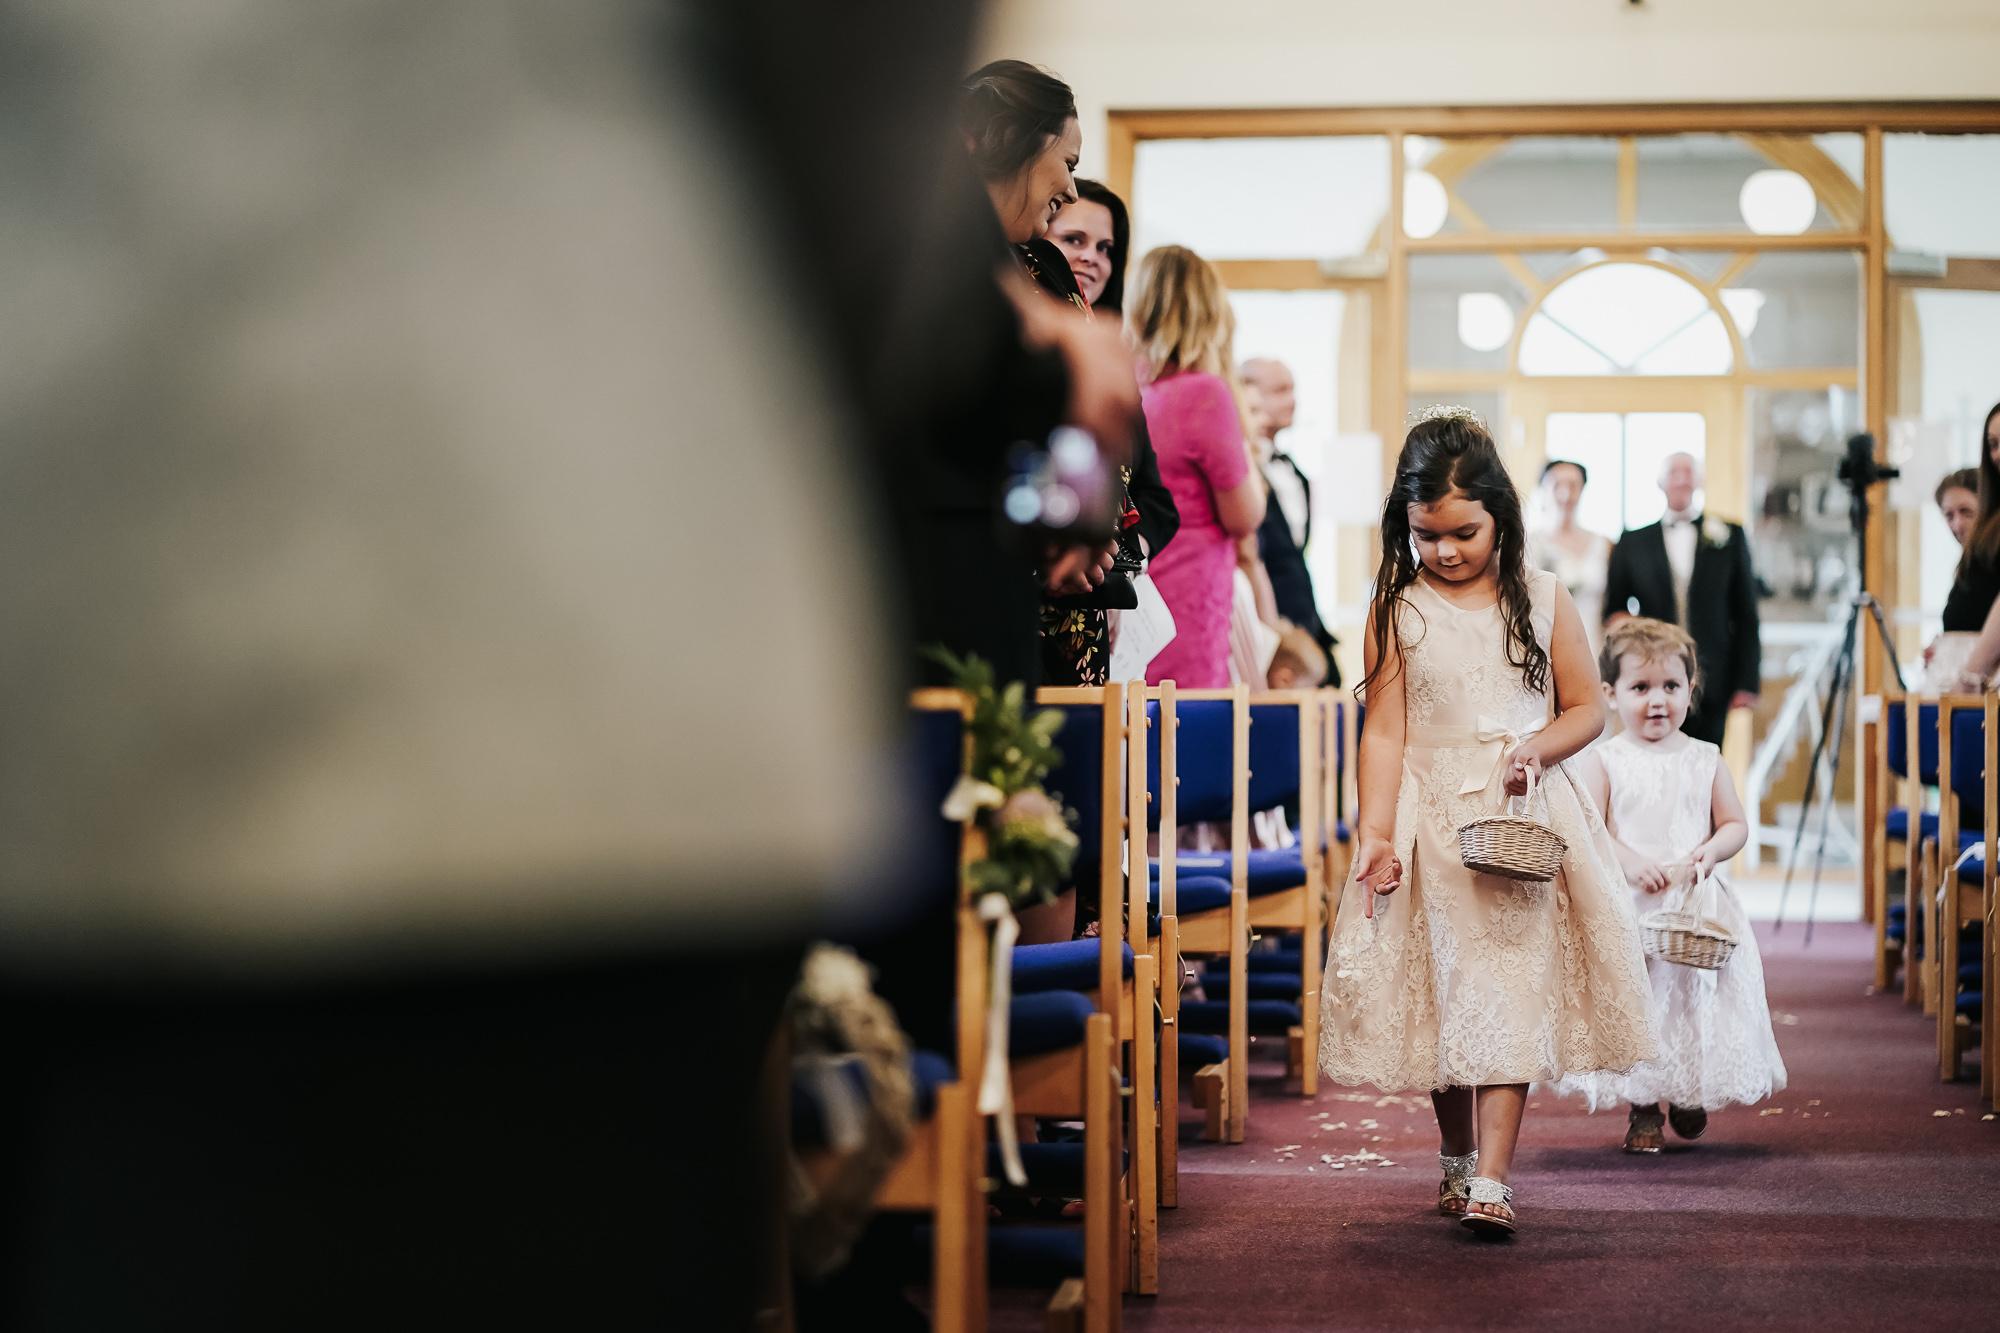 The Hayloft Wedding Photography Cheshire wedding photographer (19 of 52).jpg